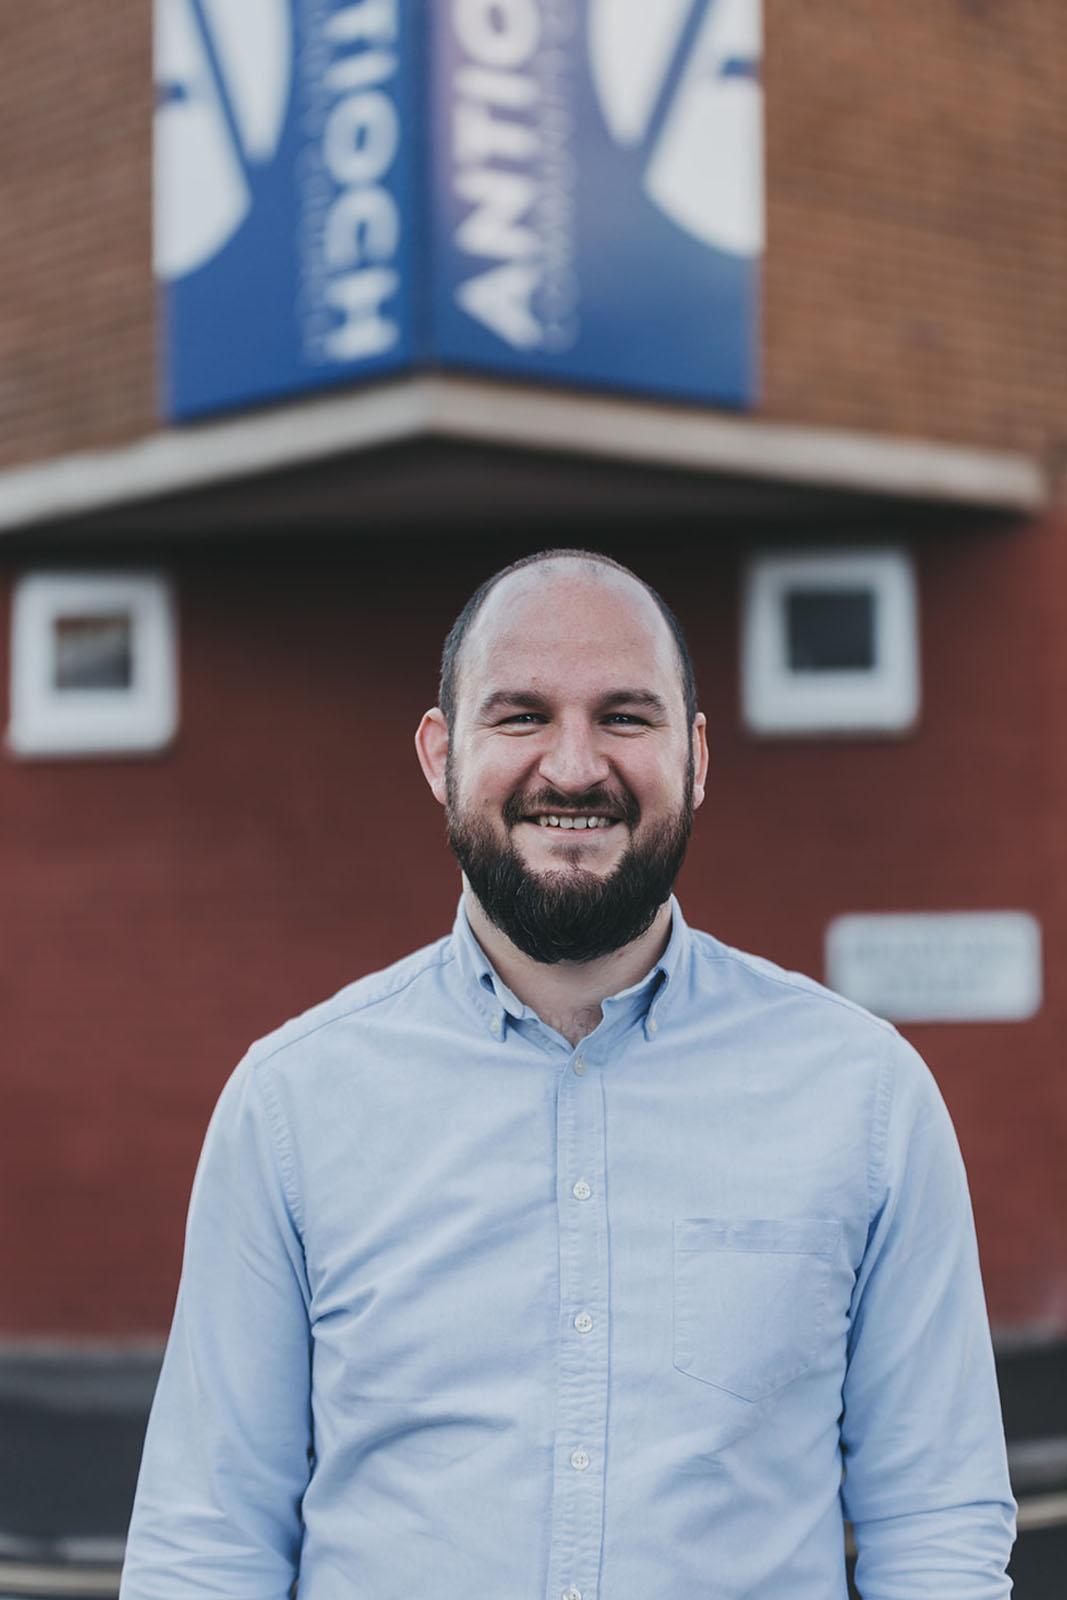 Ian Merton - Associate & Student Pastor